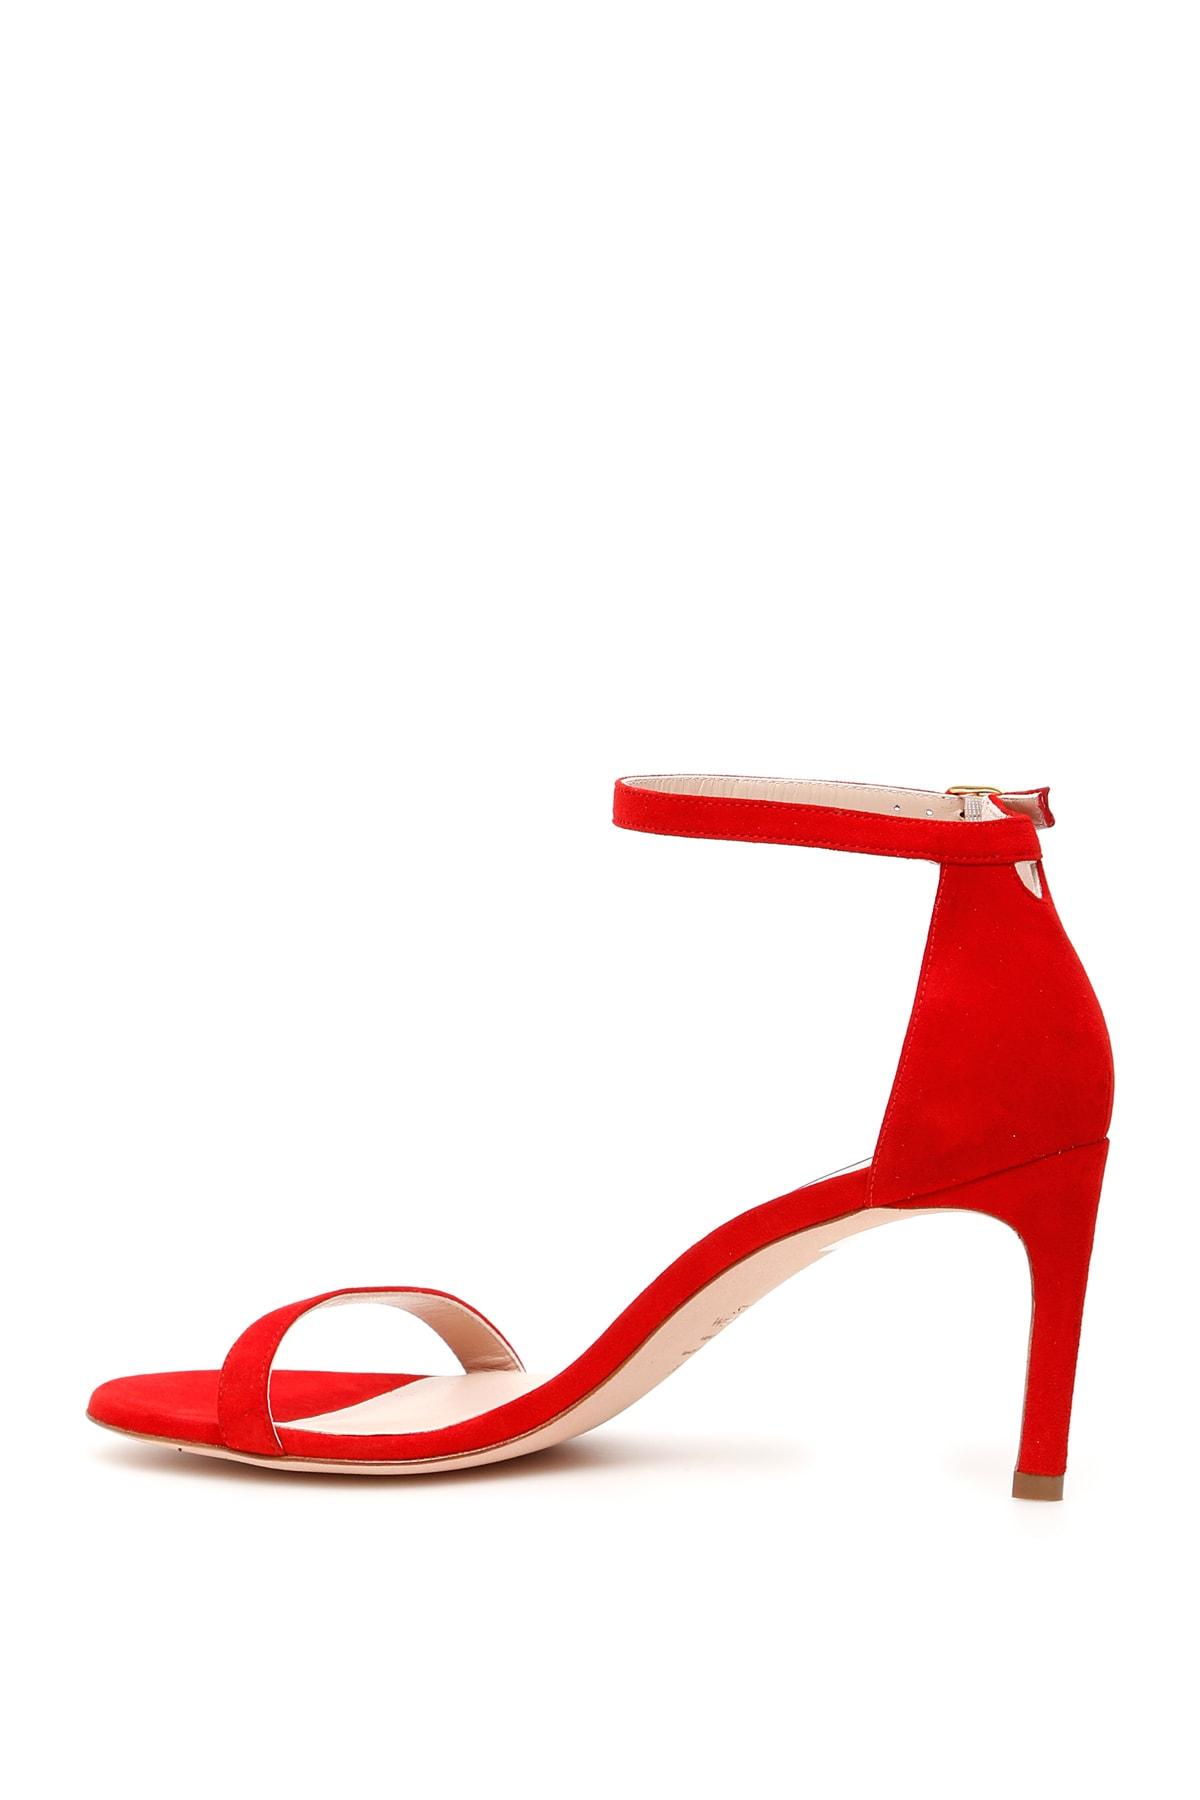 Best Price Stuart Weitzman Nunakedstraight Sandals - Great Deals